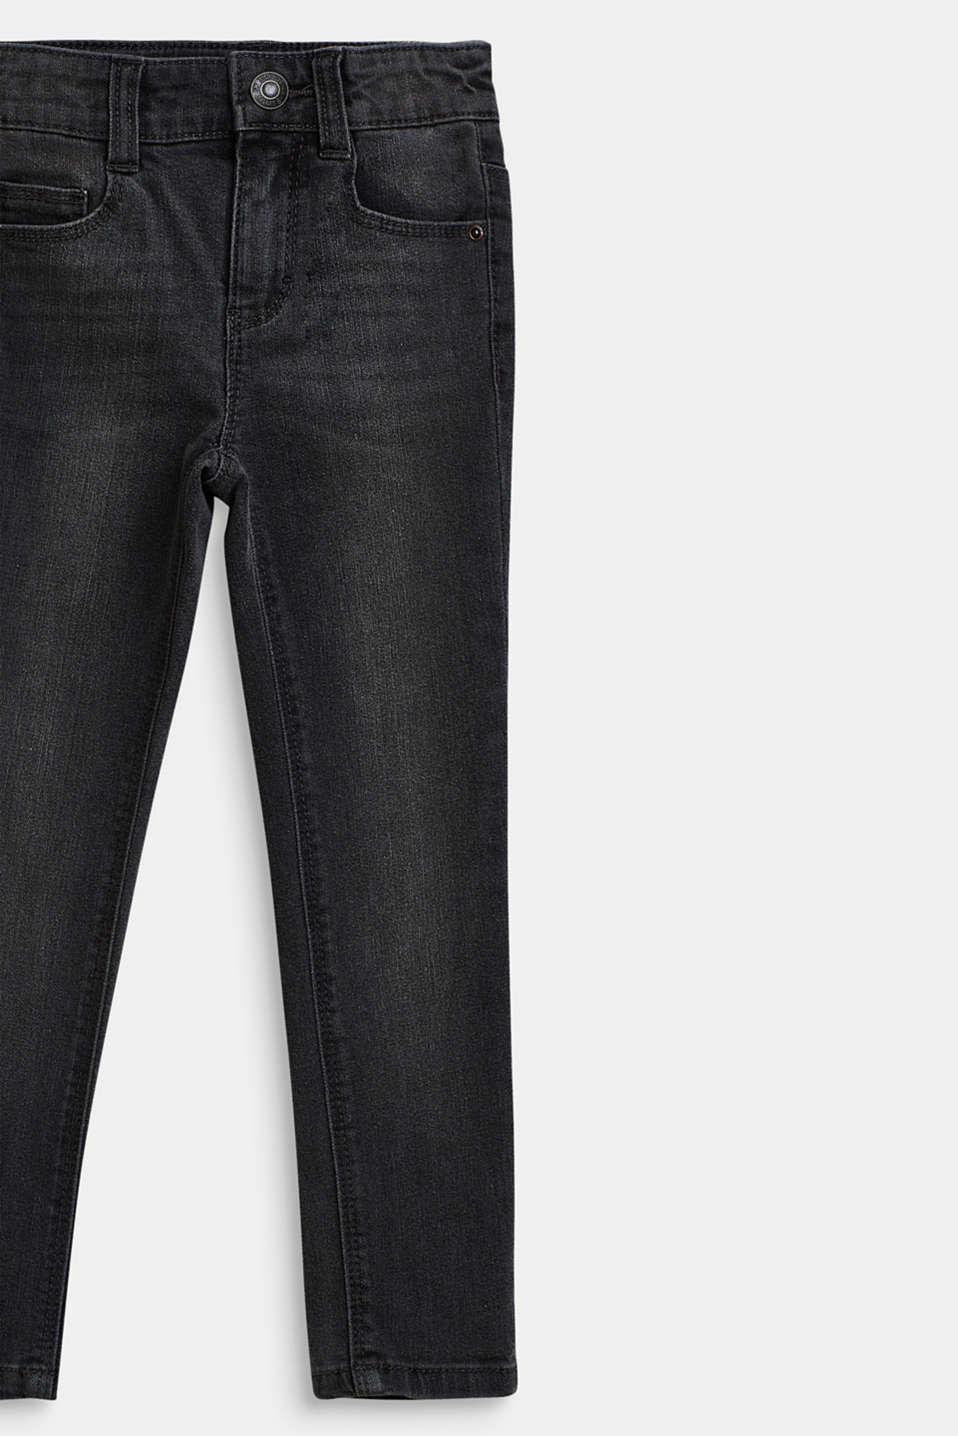 Stretch jeans with an adjustable waist, LIGHT GREY DEN, detail image number 2